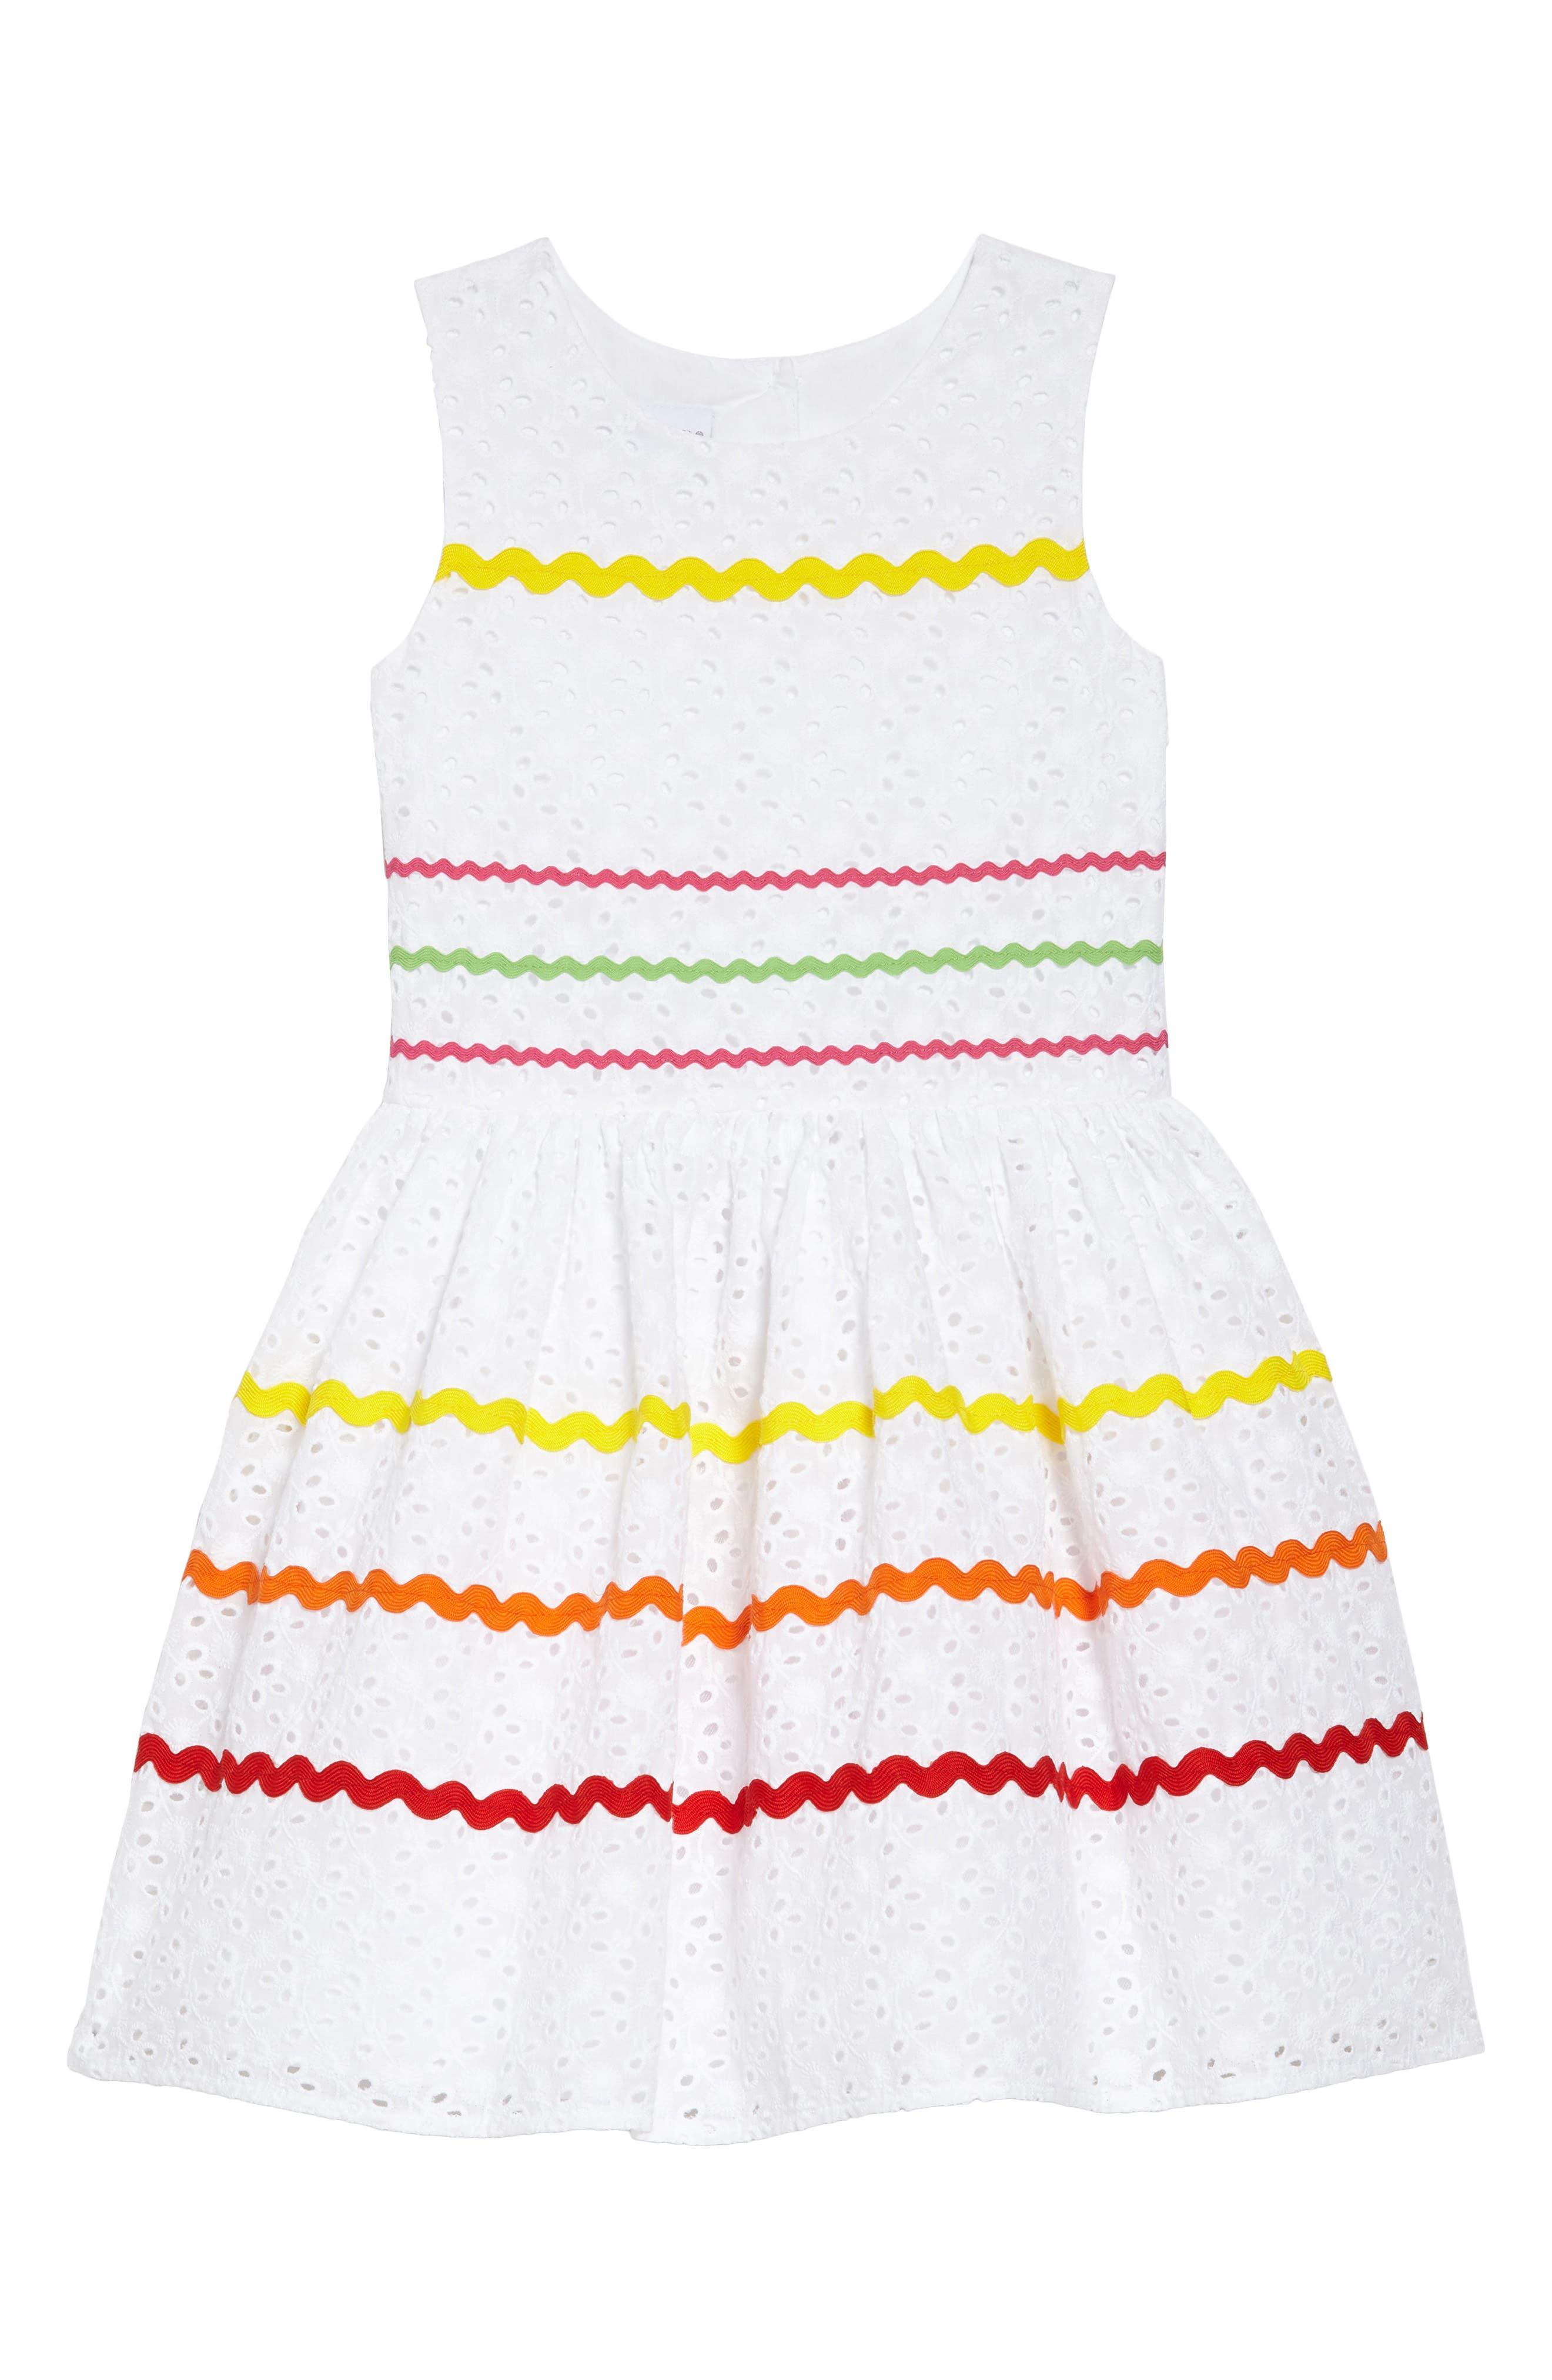 Rickrack Stripe Eyelet Dress,                             Main thumbnail 1, color,                             White